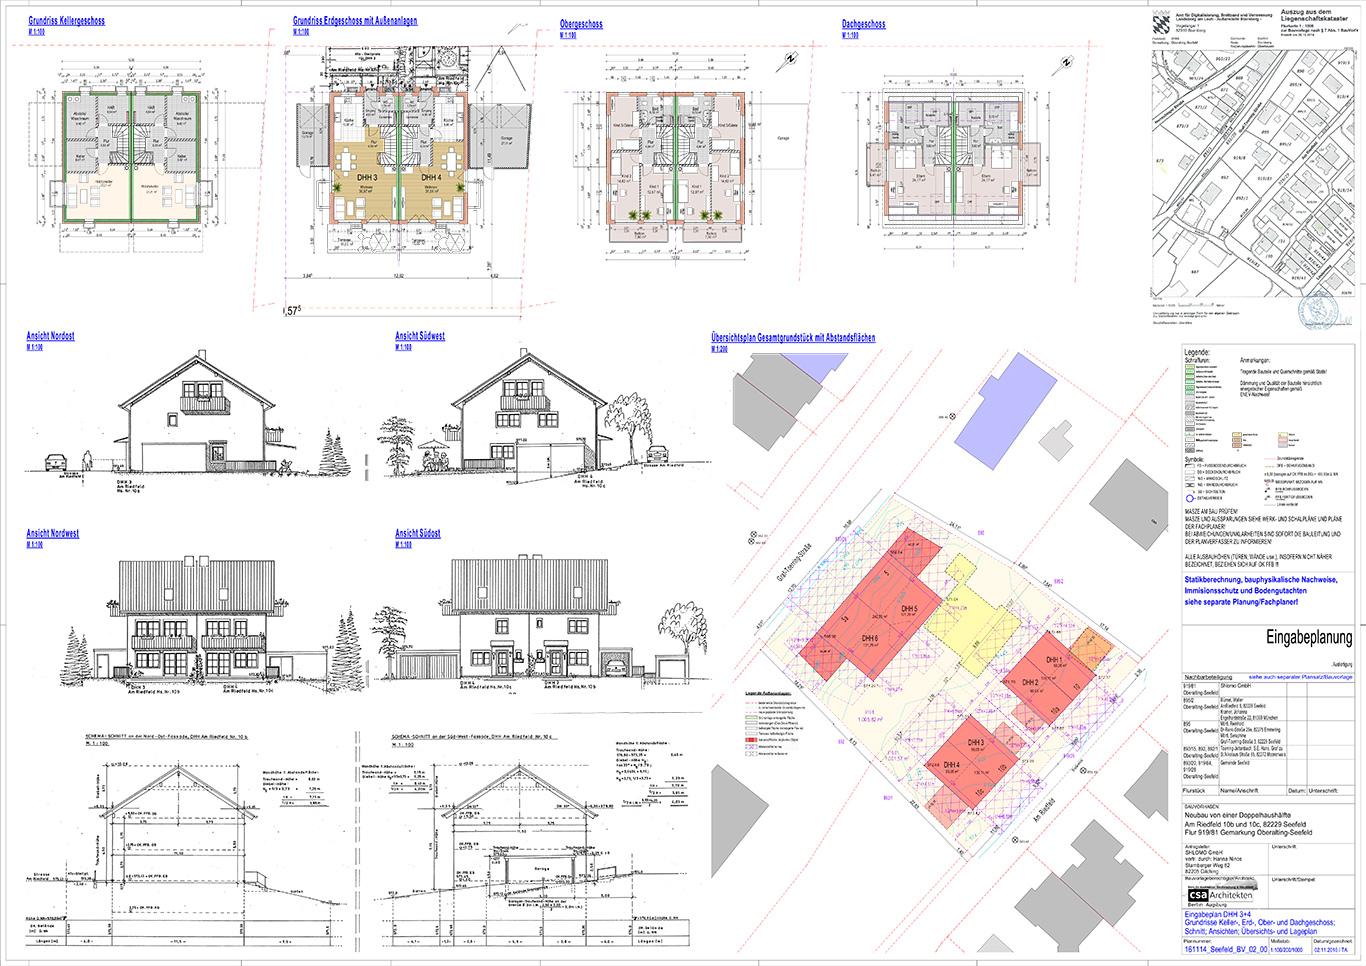 seefeld allg uer massivhaus gmbhallg uer massivhaus gmbh. Black Bedroom Furniture Sets. Home Design Ideas